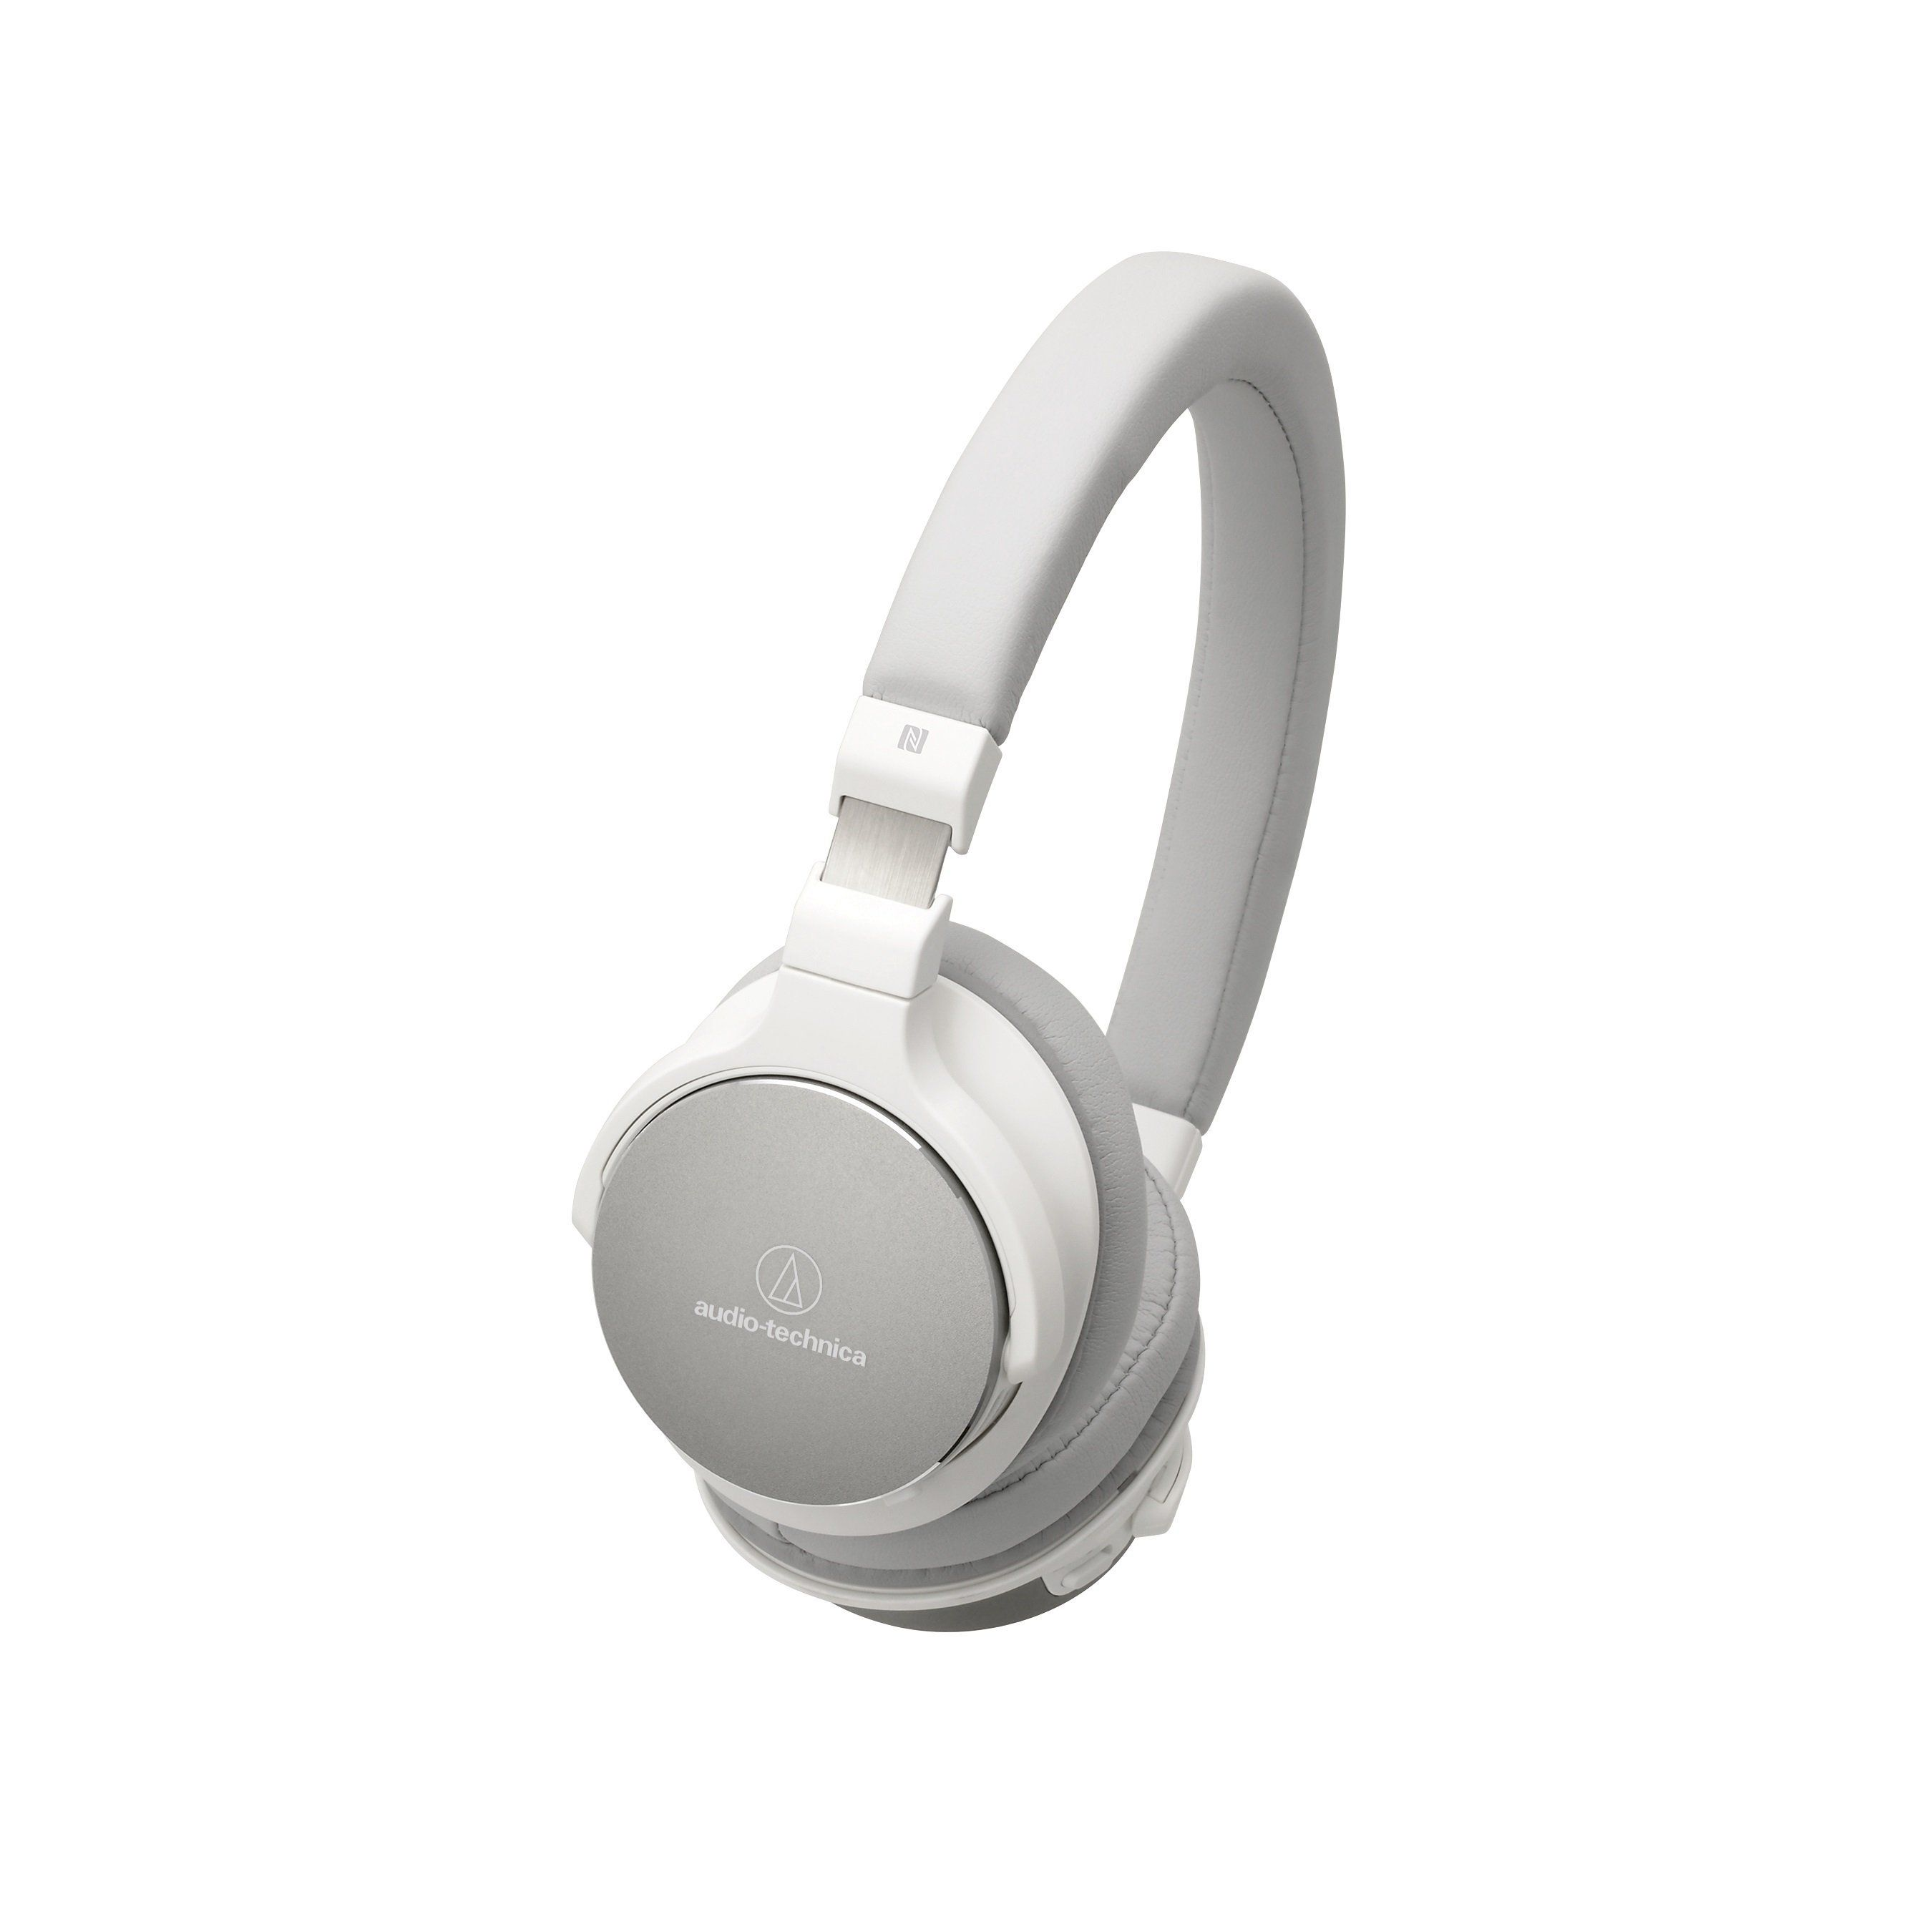 Audio Technica ATH-SR5BTWH Wireless On-Ear High-Resolution Audio Headphones- White #audioheadphones